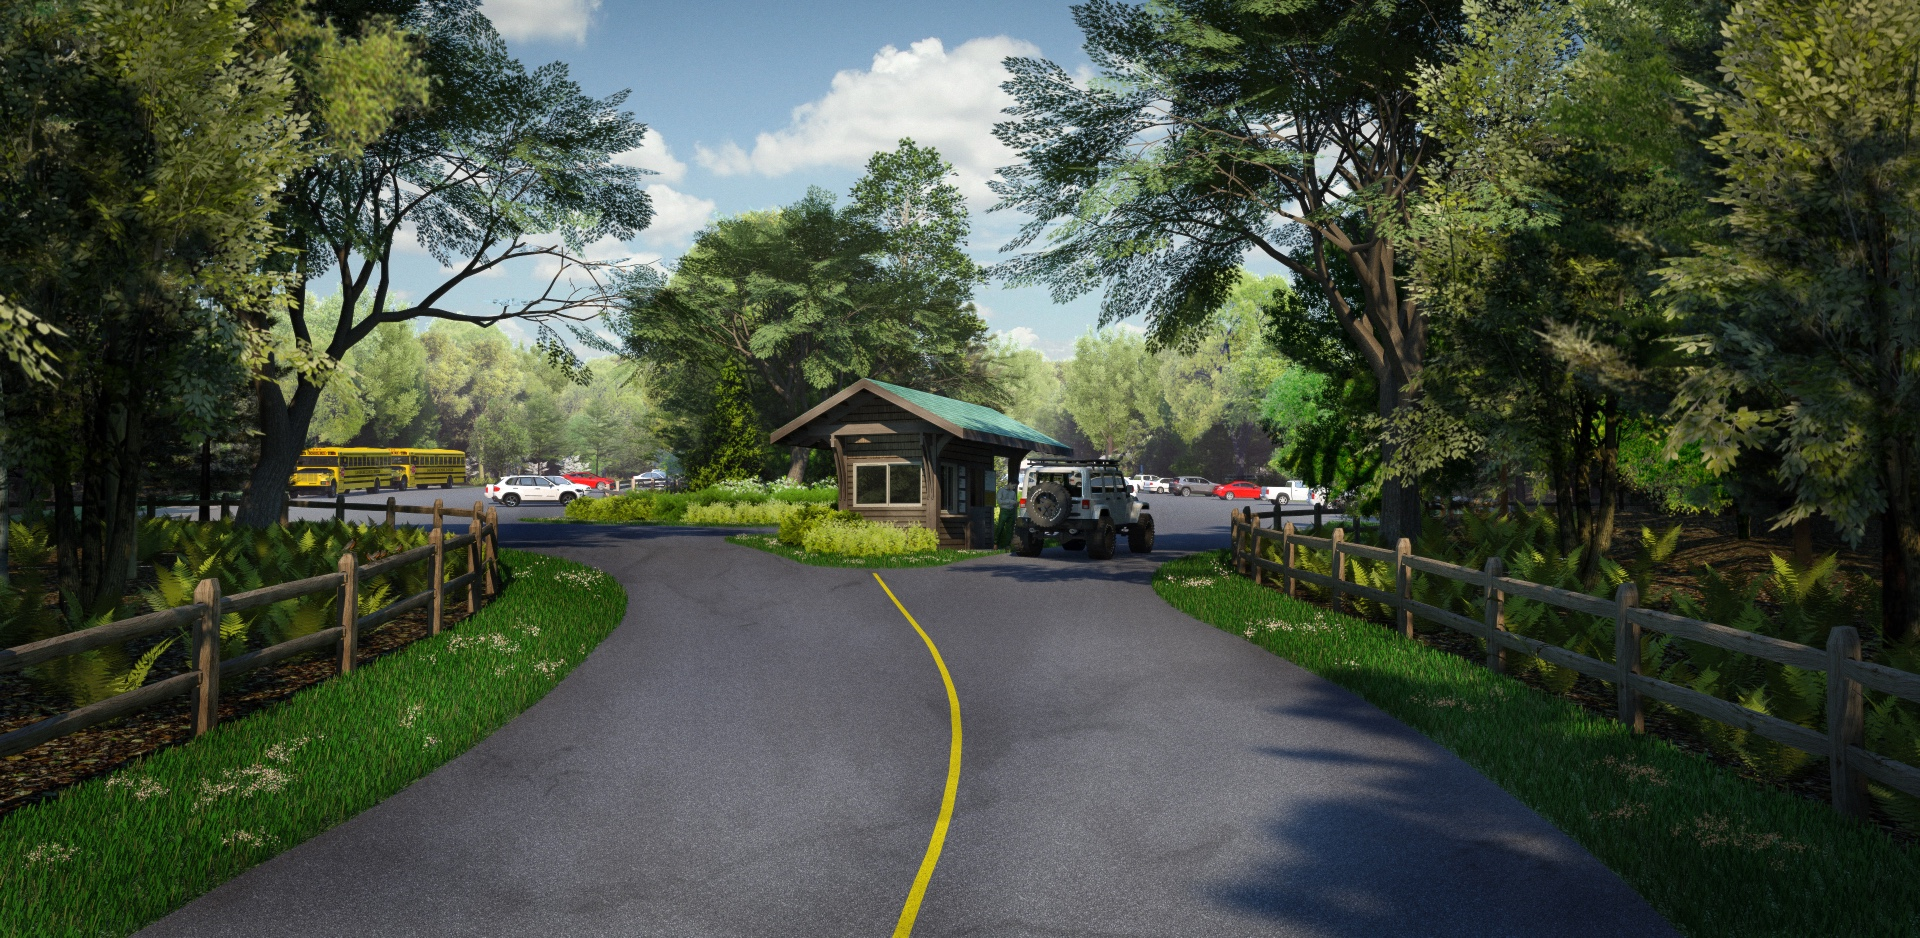 nature park entry.jpg